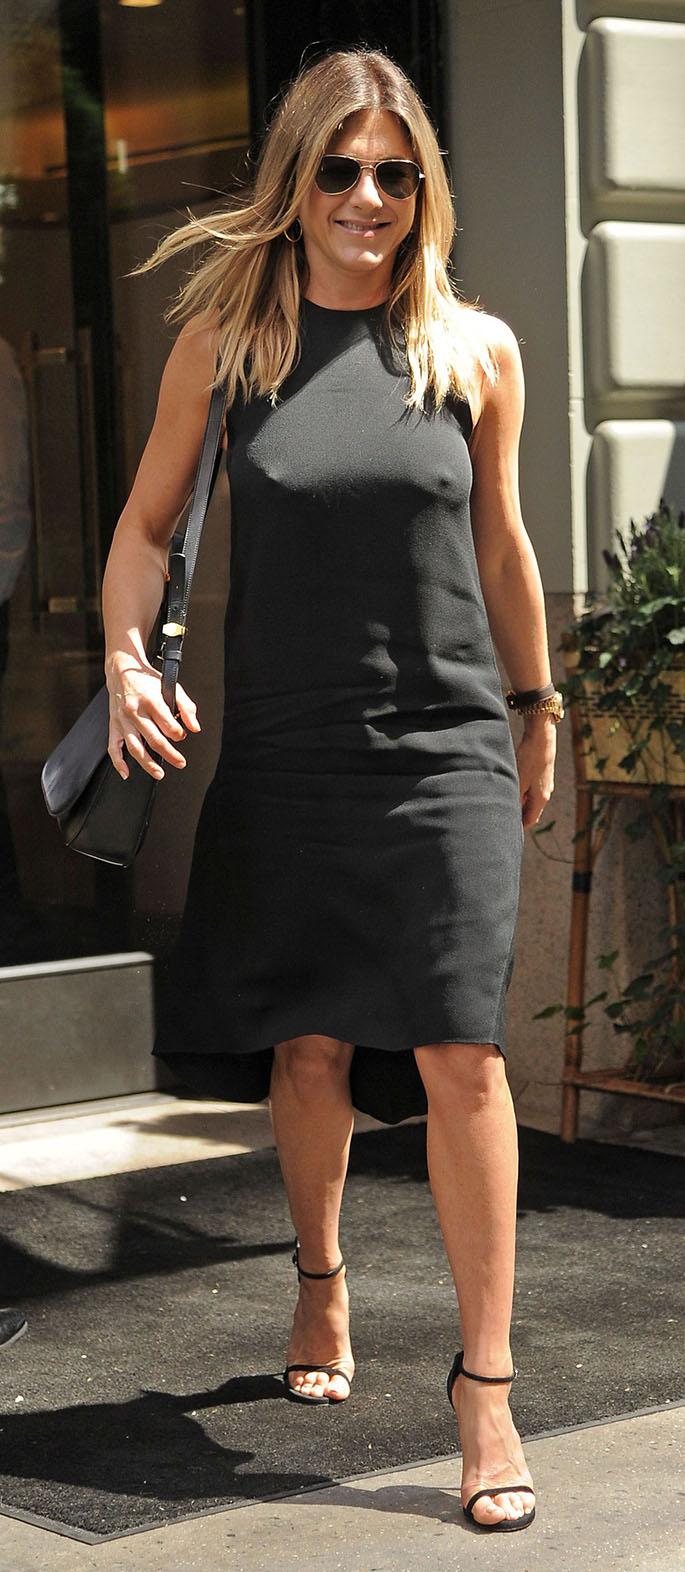 celebrity-natural-sporty-style-type-jenniferaniston-littleblackdress-lbd-simple-streetstyle.jpg